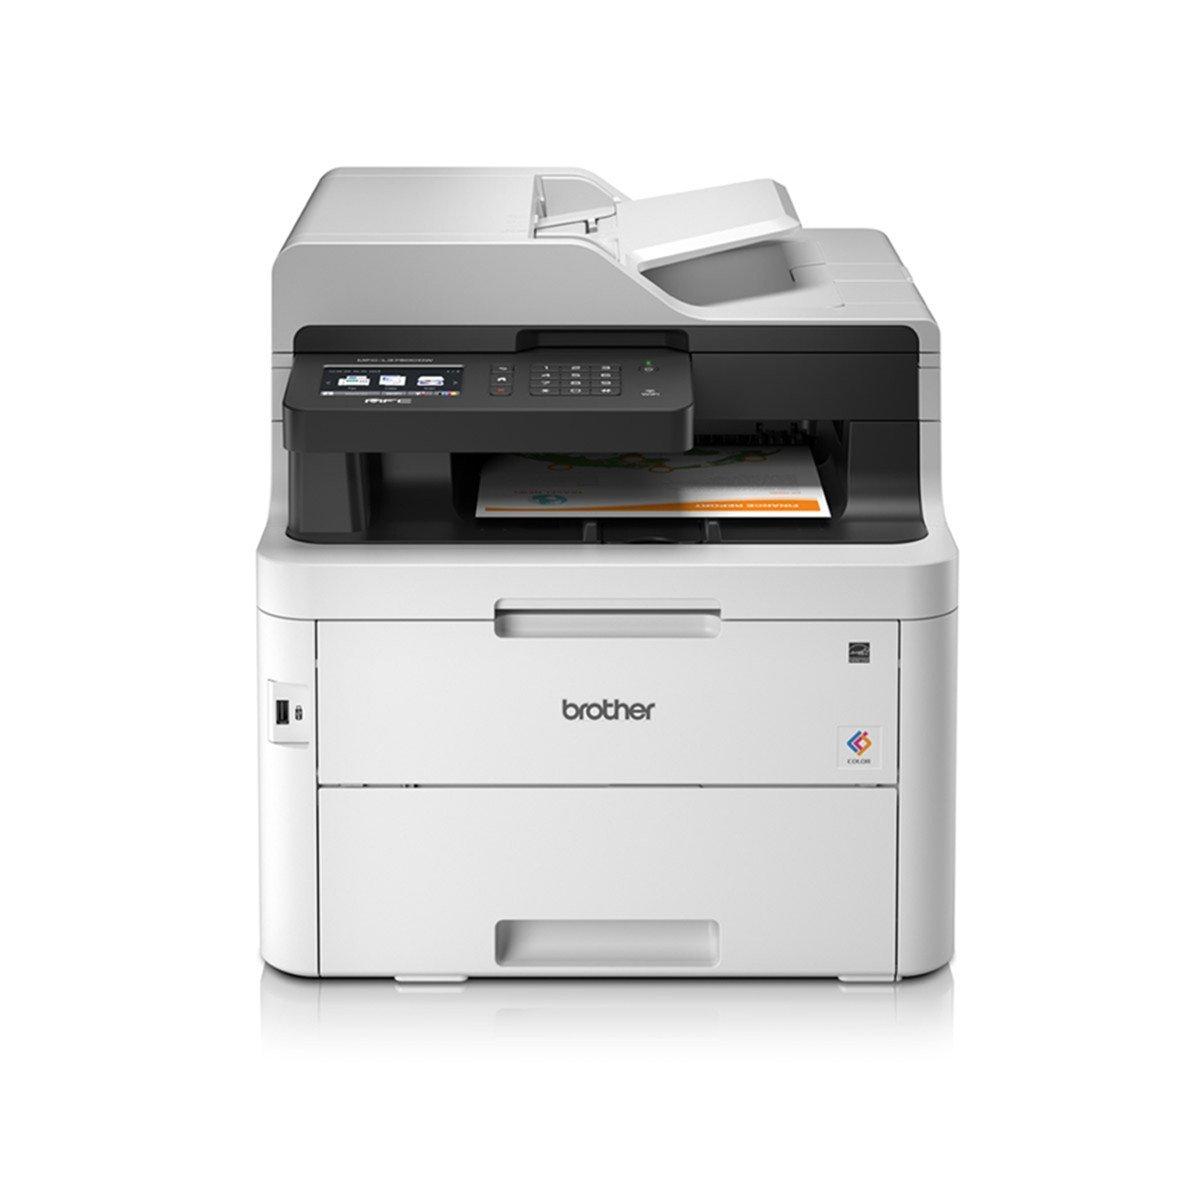 Impressora Multifuncional Brother Laser Color L3750CDW, Preta - MFC-L3750CDW